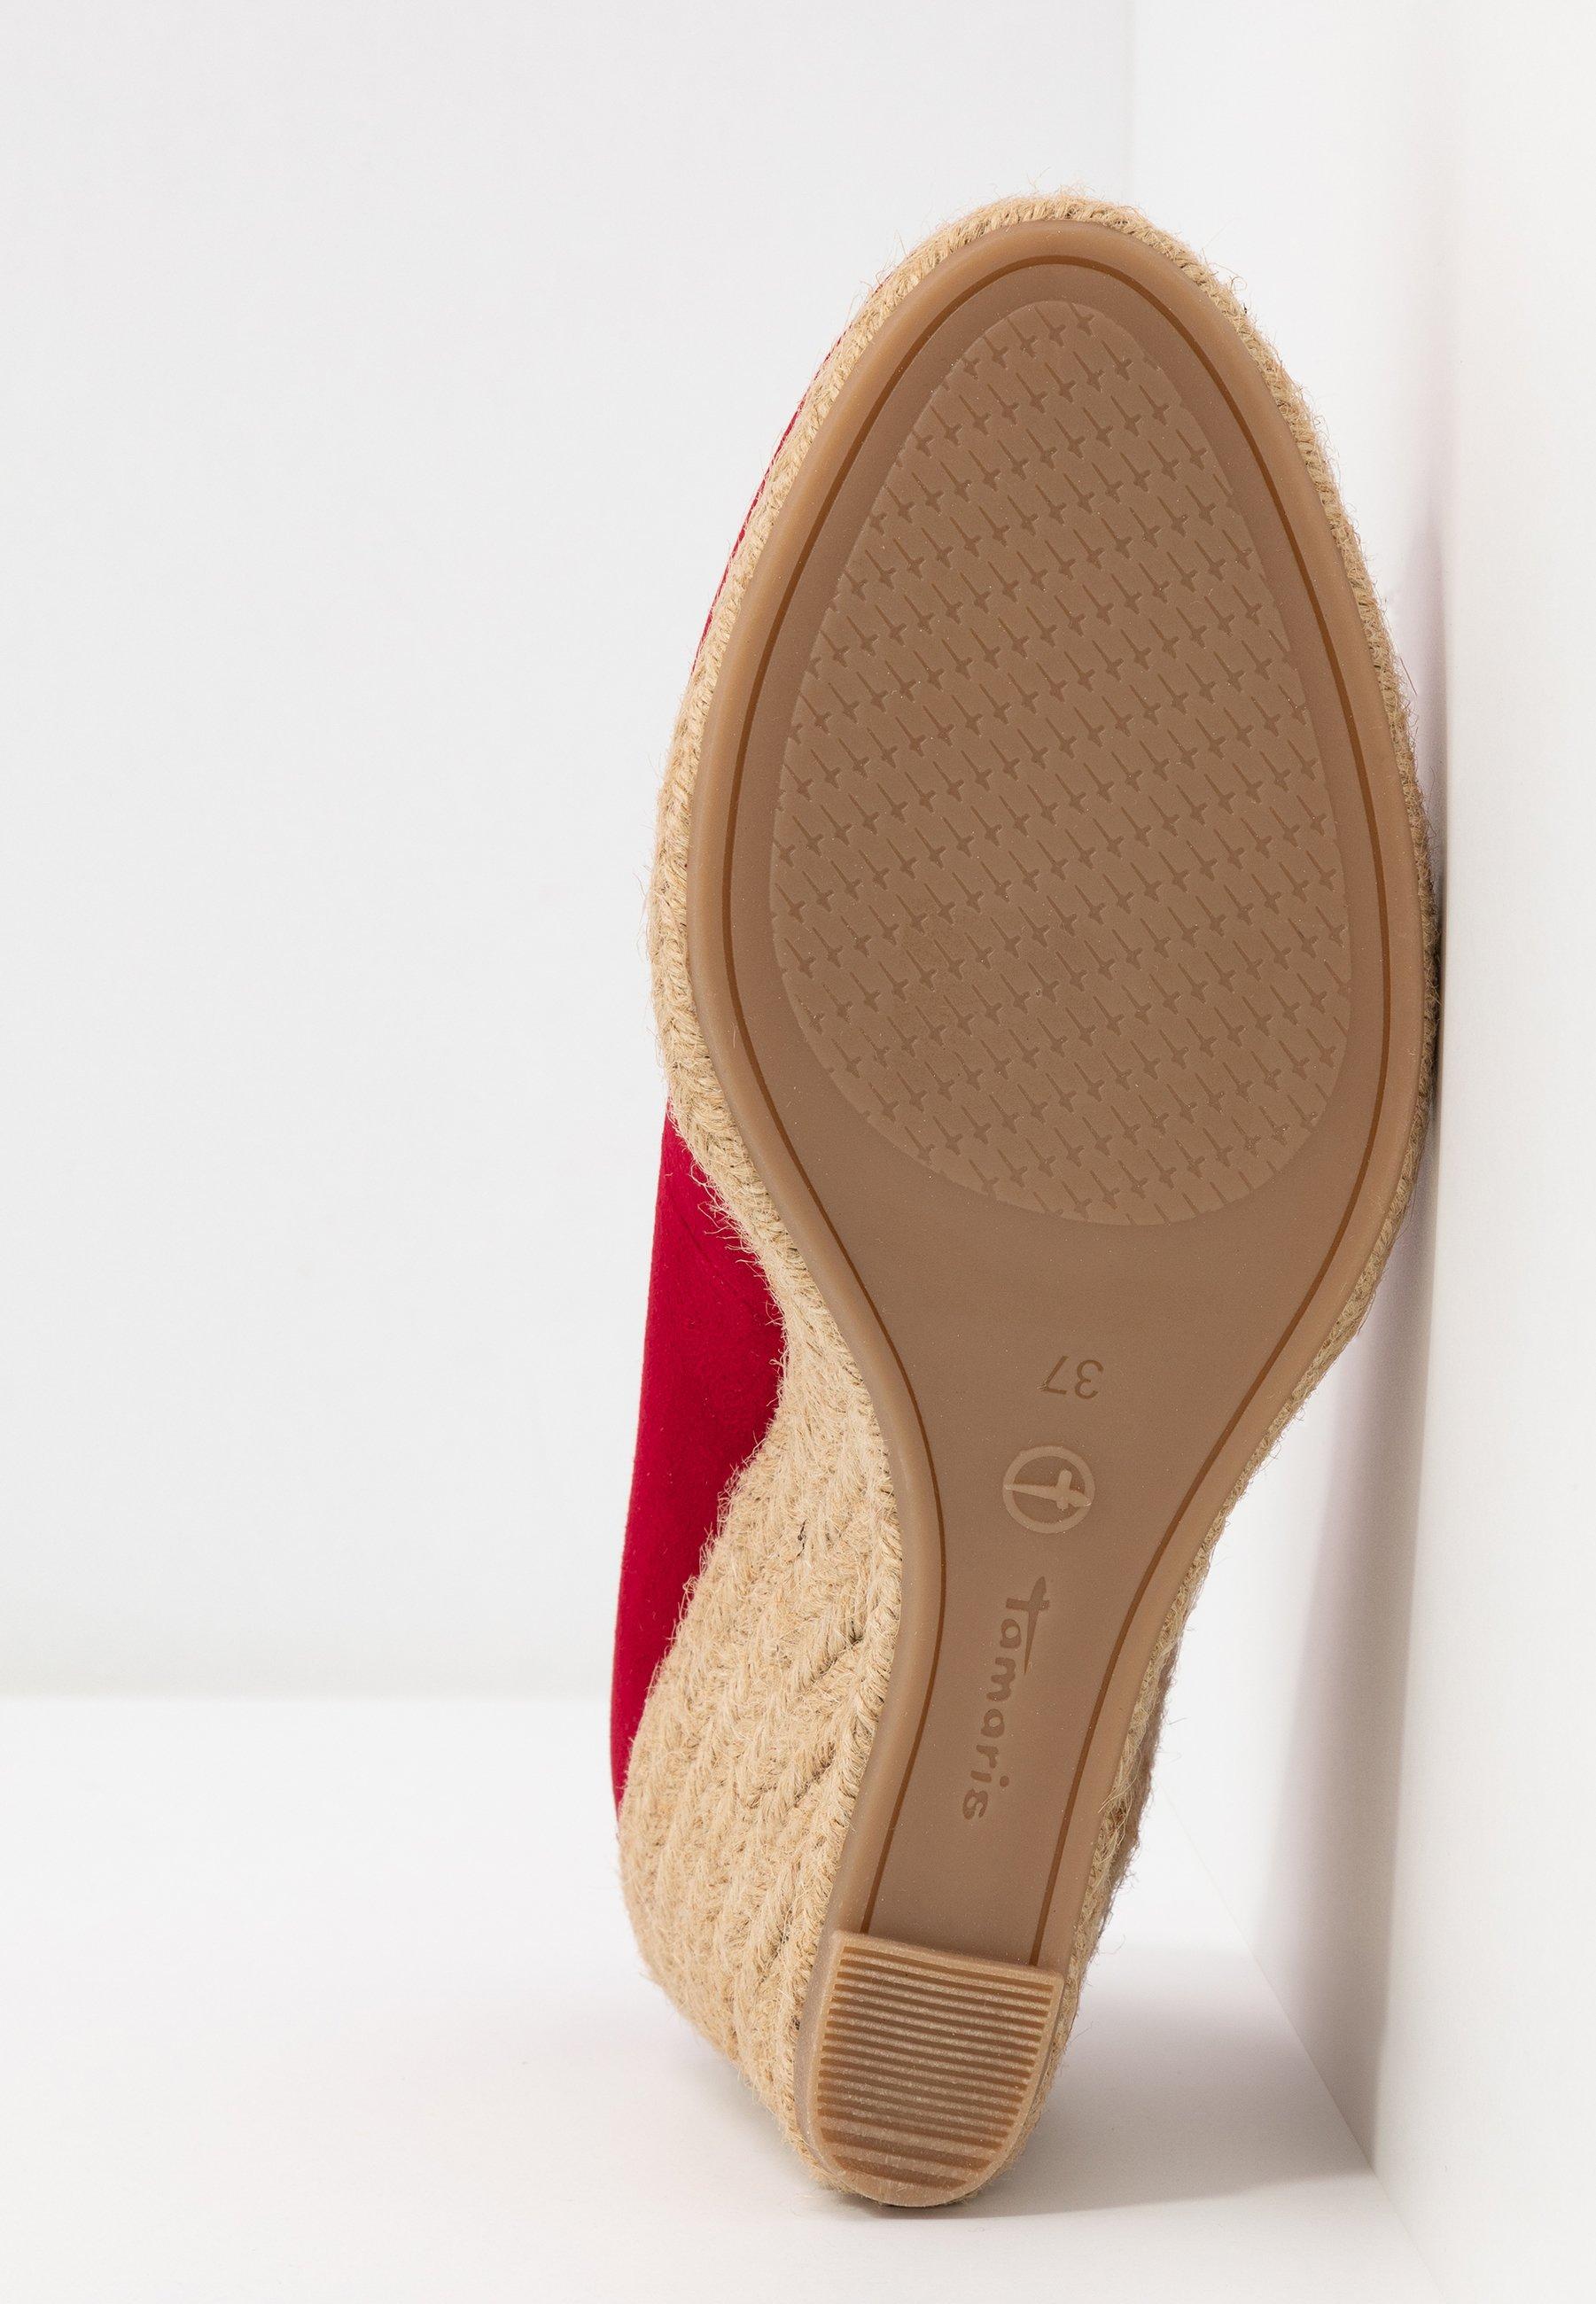 Tamaris COURT SHOE - High Heel Pumps - lipstick  Pumps für Damen 48lHU